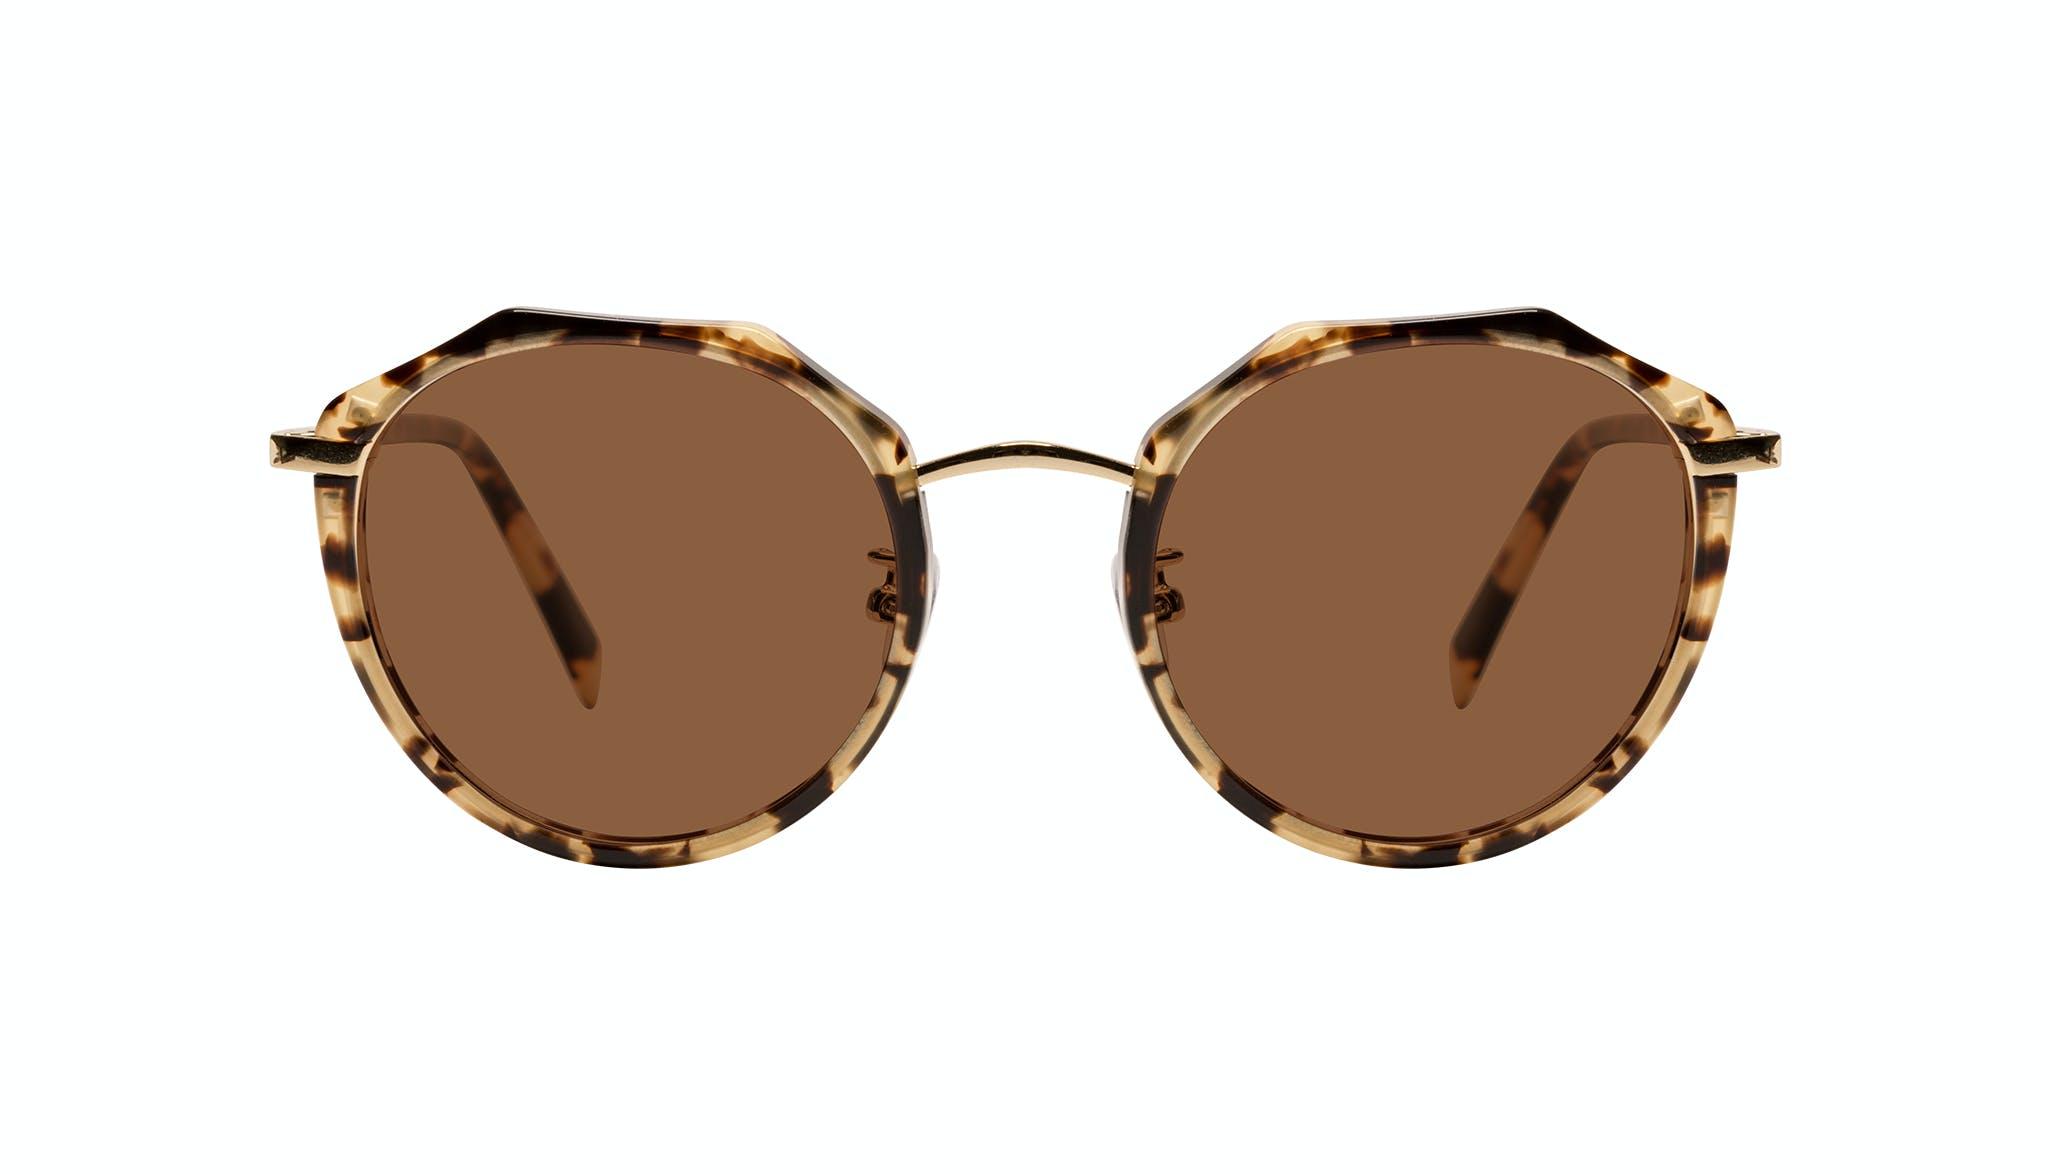 Affordable Fashion Glasses Round Sunglasses Women Womance Mayz